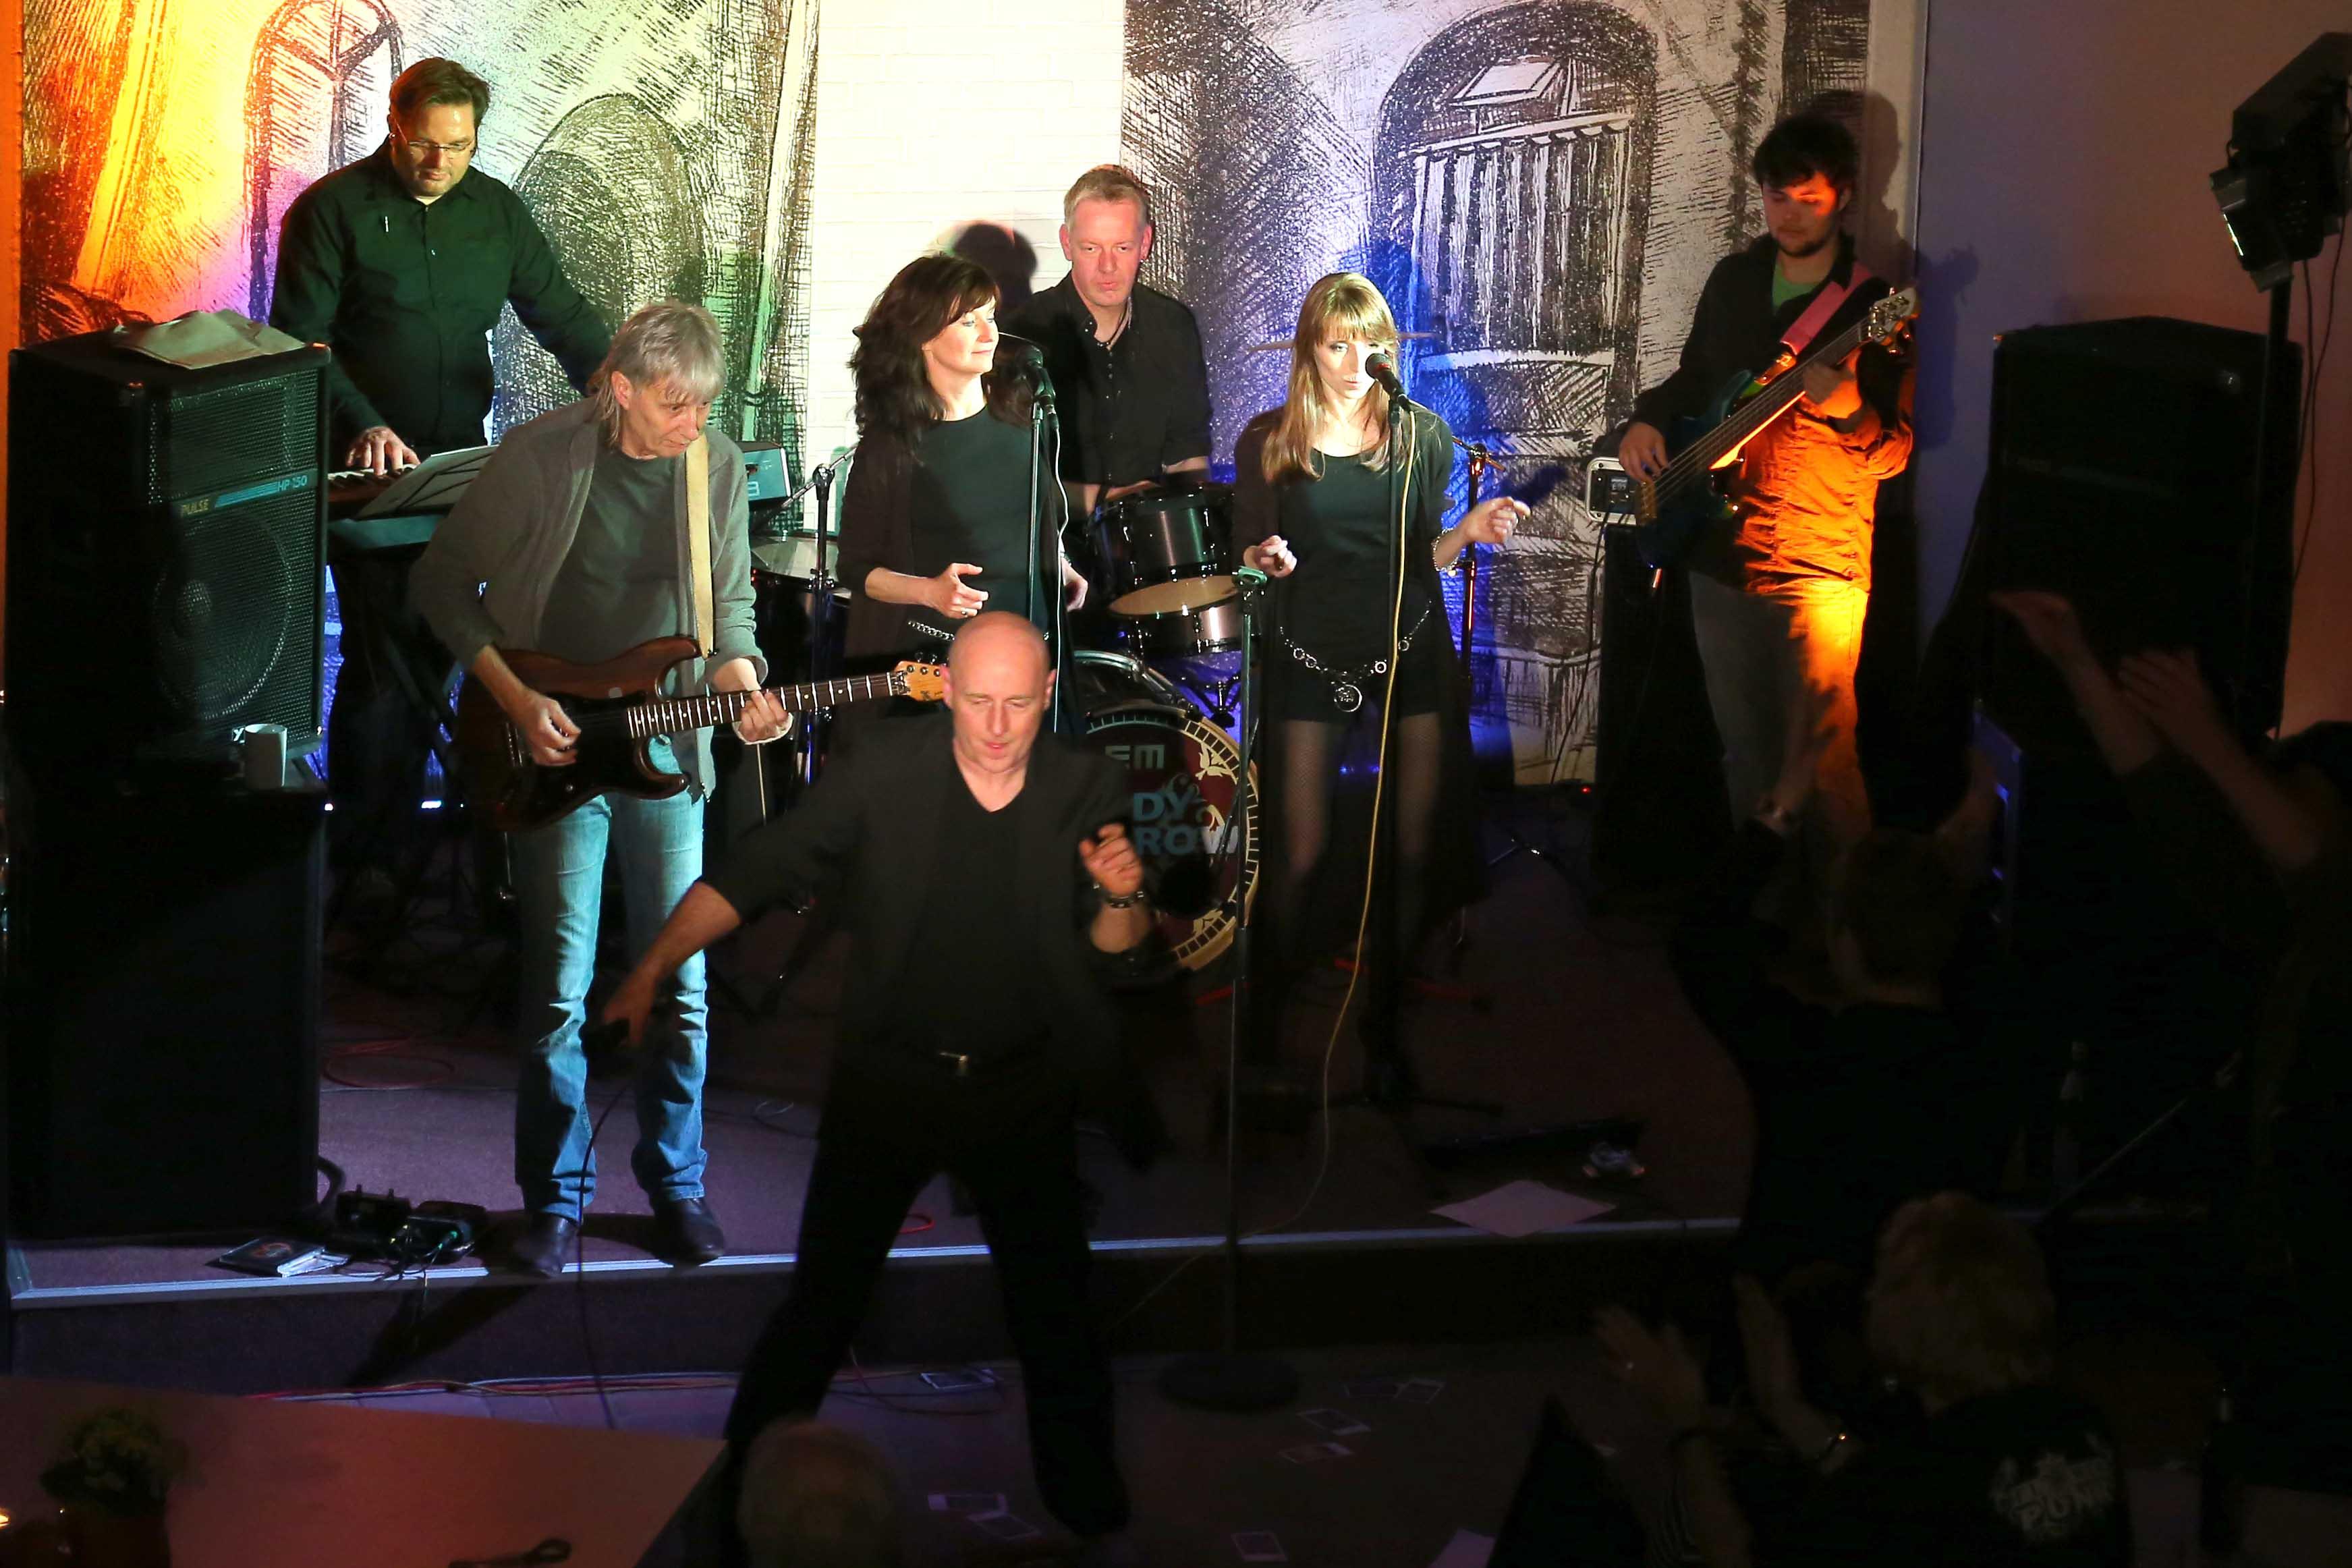 Eddy Monrow rockt die Kirche in Kiel ...